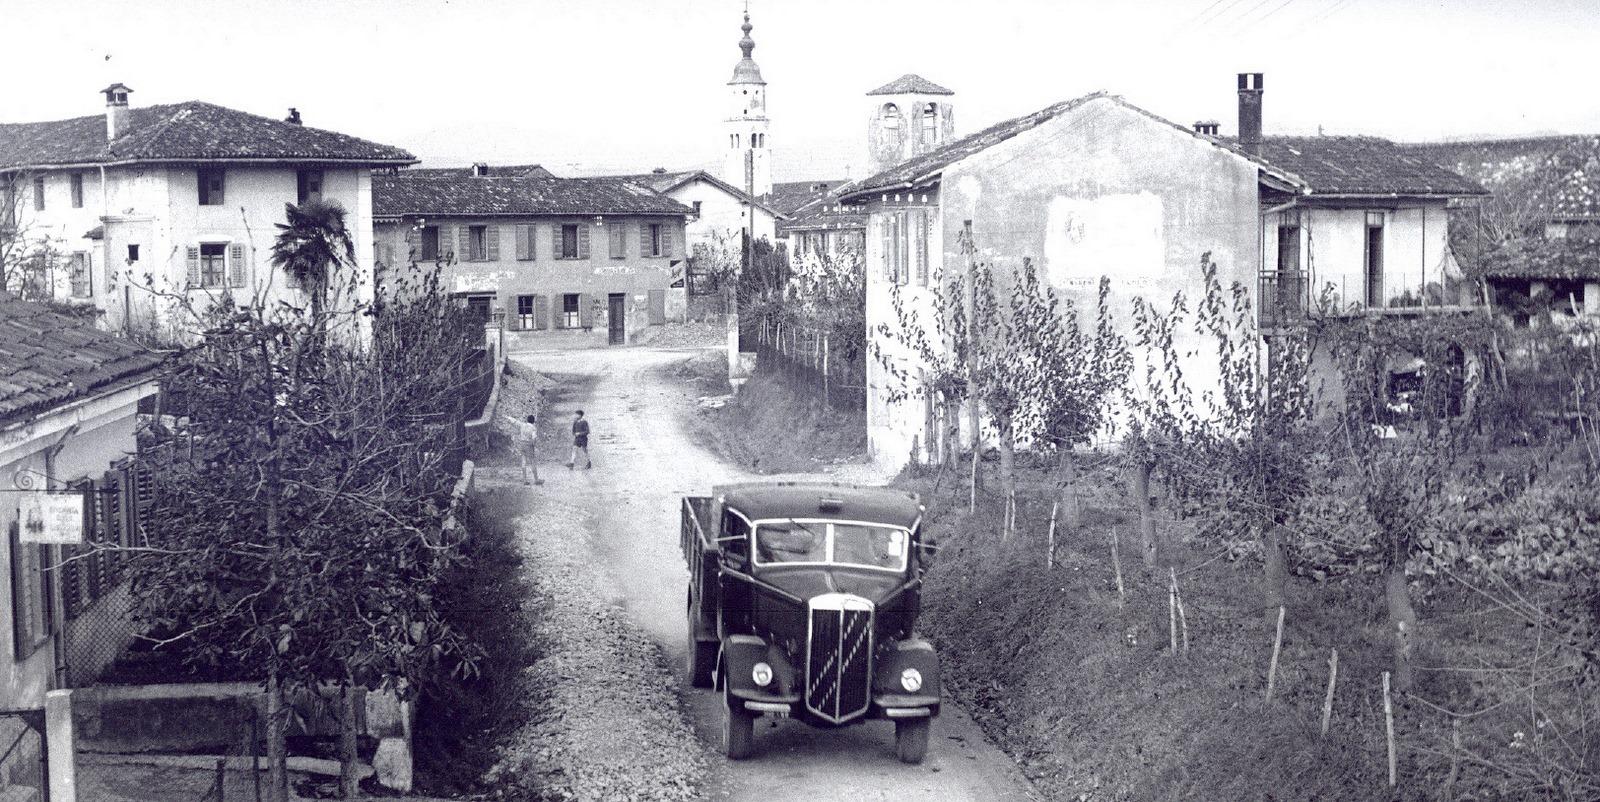 Lancia---1951